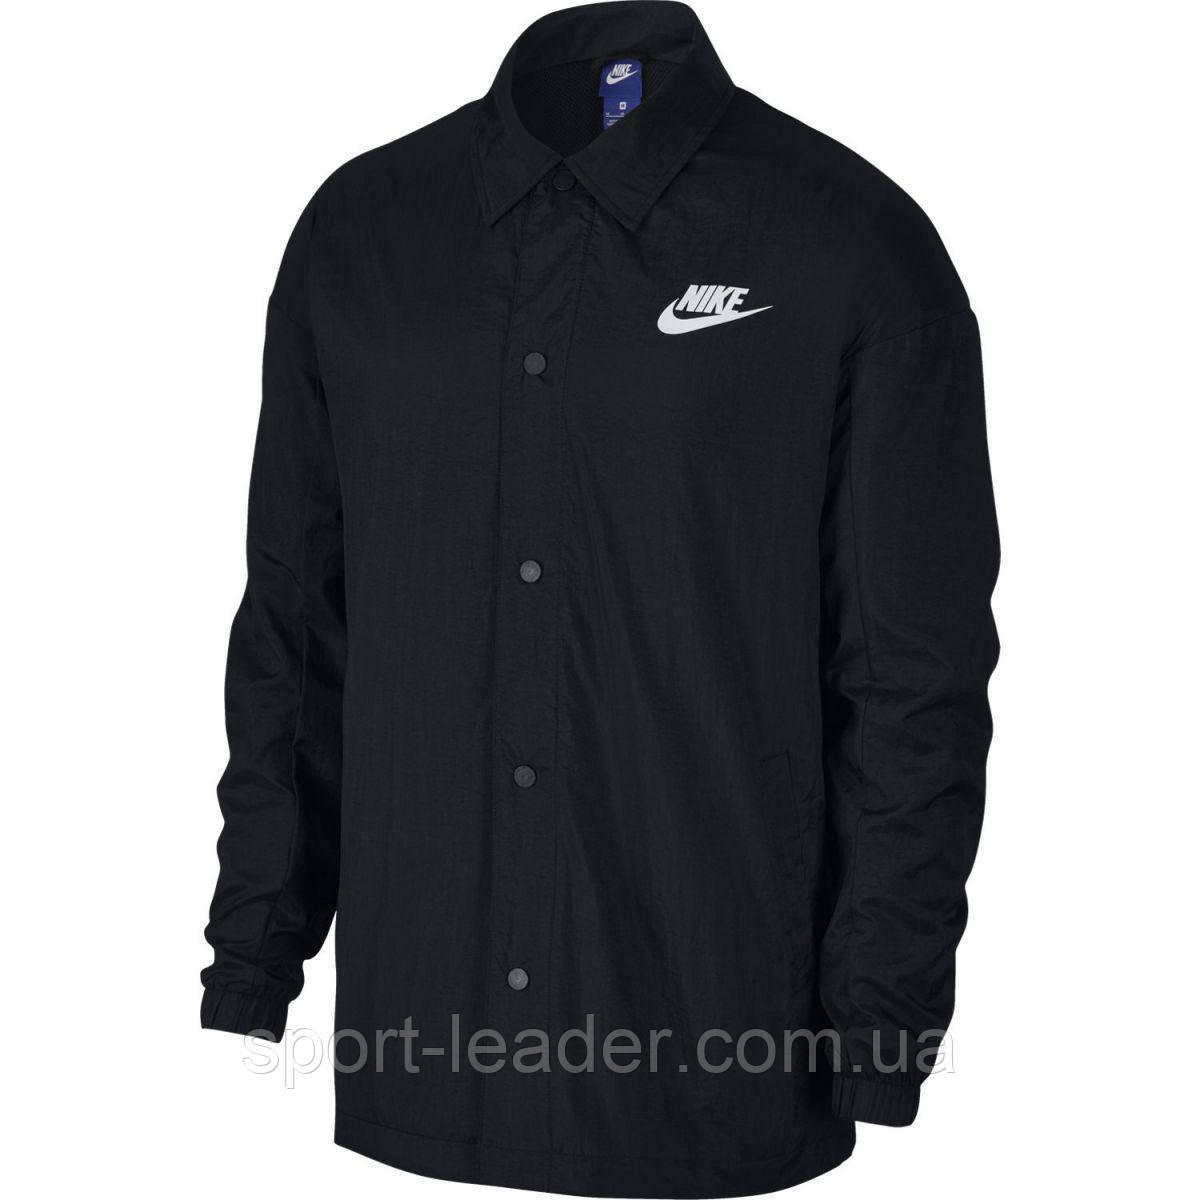 f96cb3a4 Куртка мужская Nike Sportswear Woven Hybrid 885953-010 - Sport-Leader в  Киеве